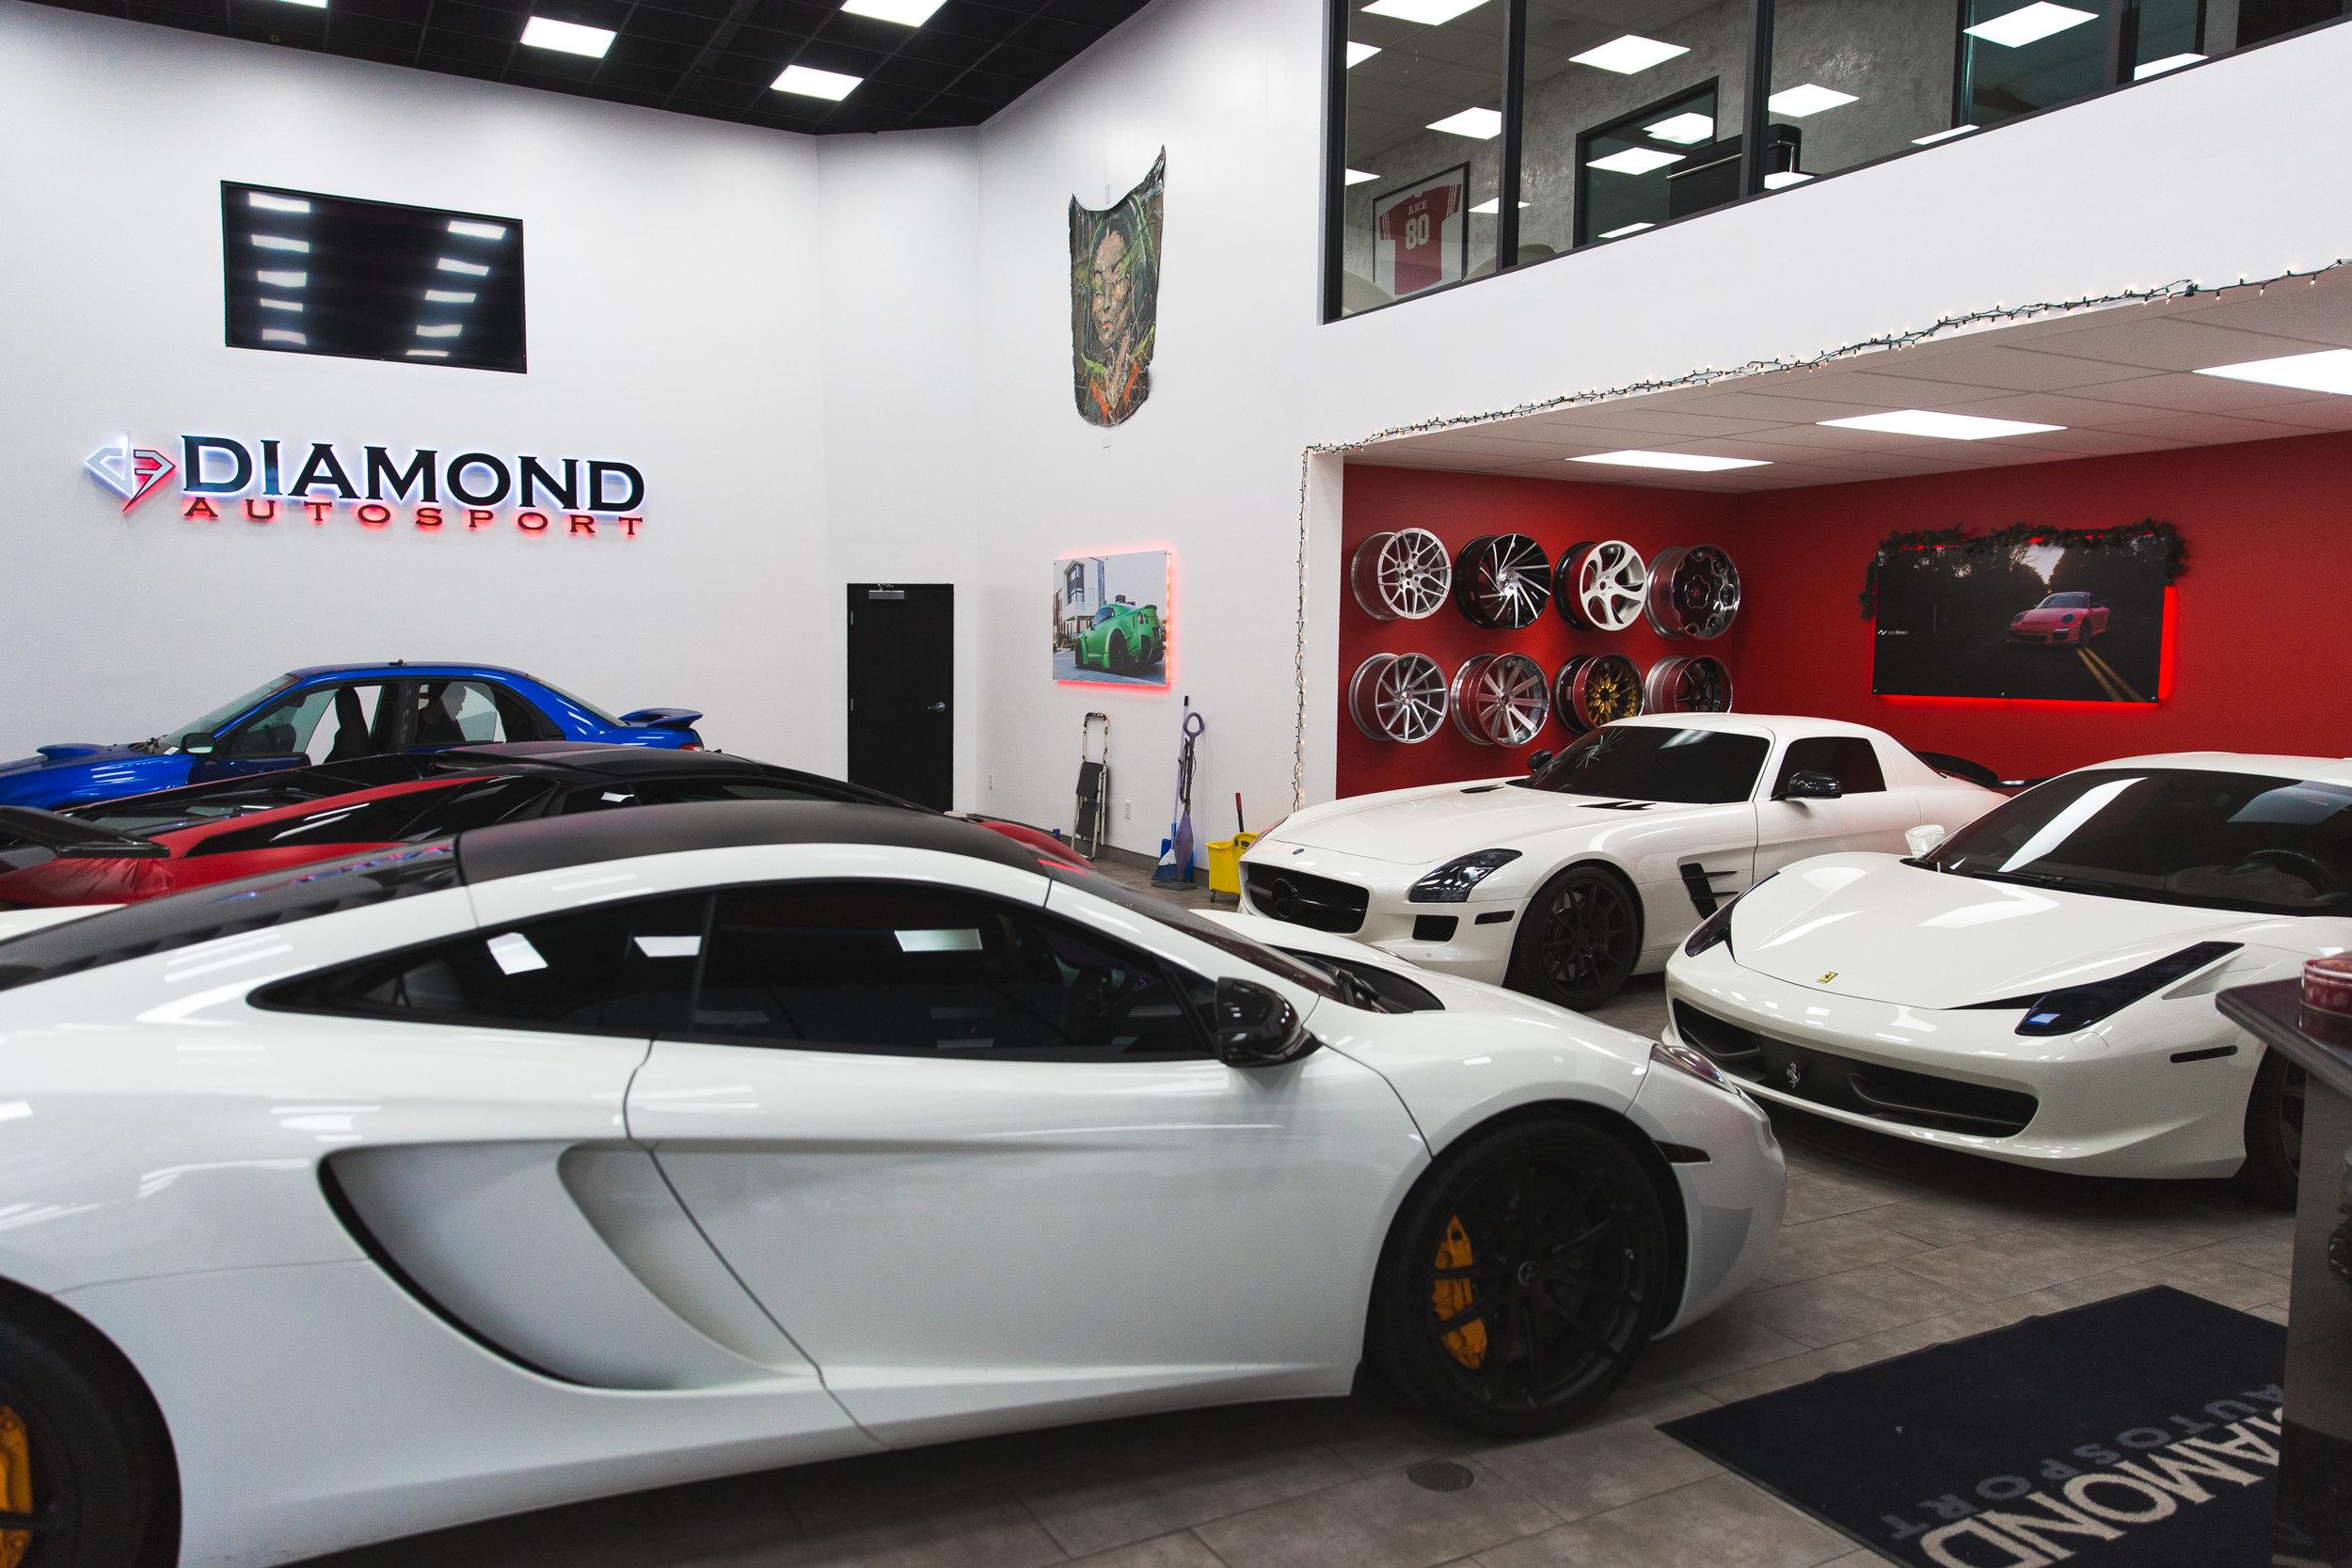 Stay_Driven_Sacramento_Diamond_Autosport-3.jpg